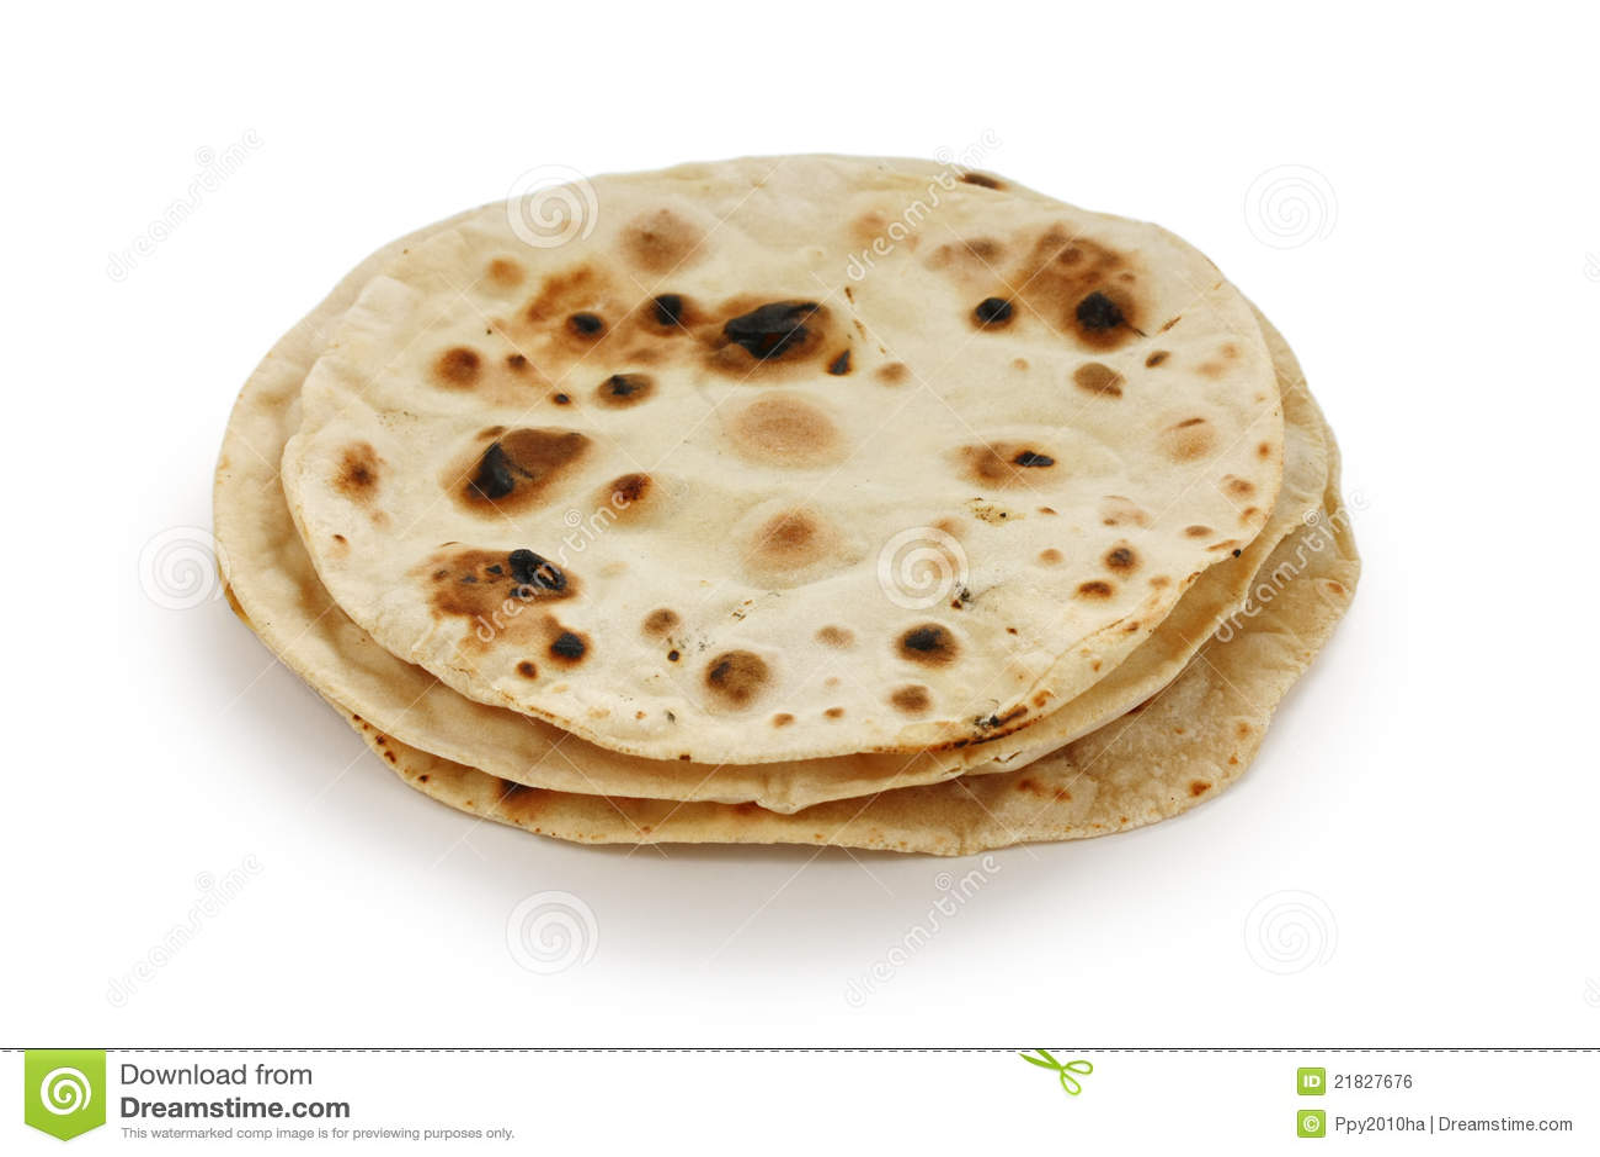 Chapati , Indian Unleavened Flatbread Royalty Free Stock Image - Image ...